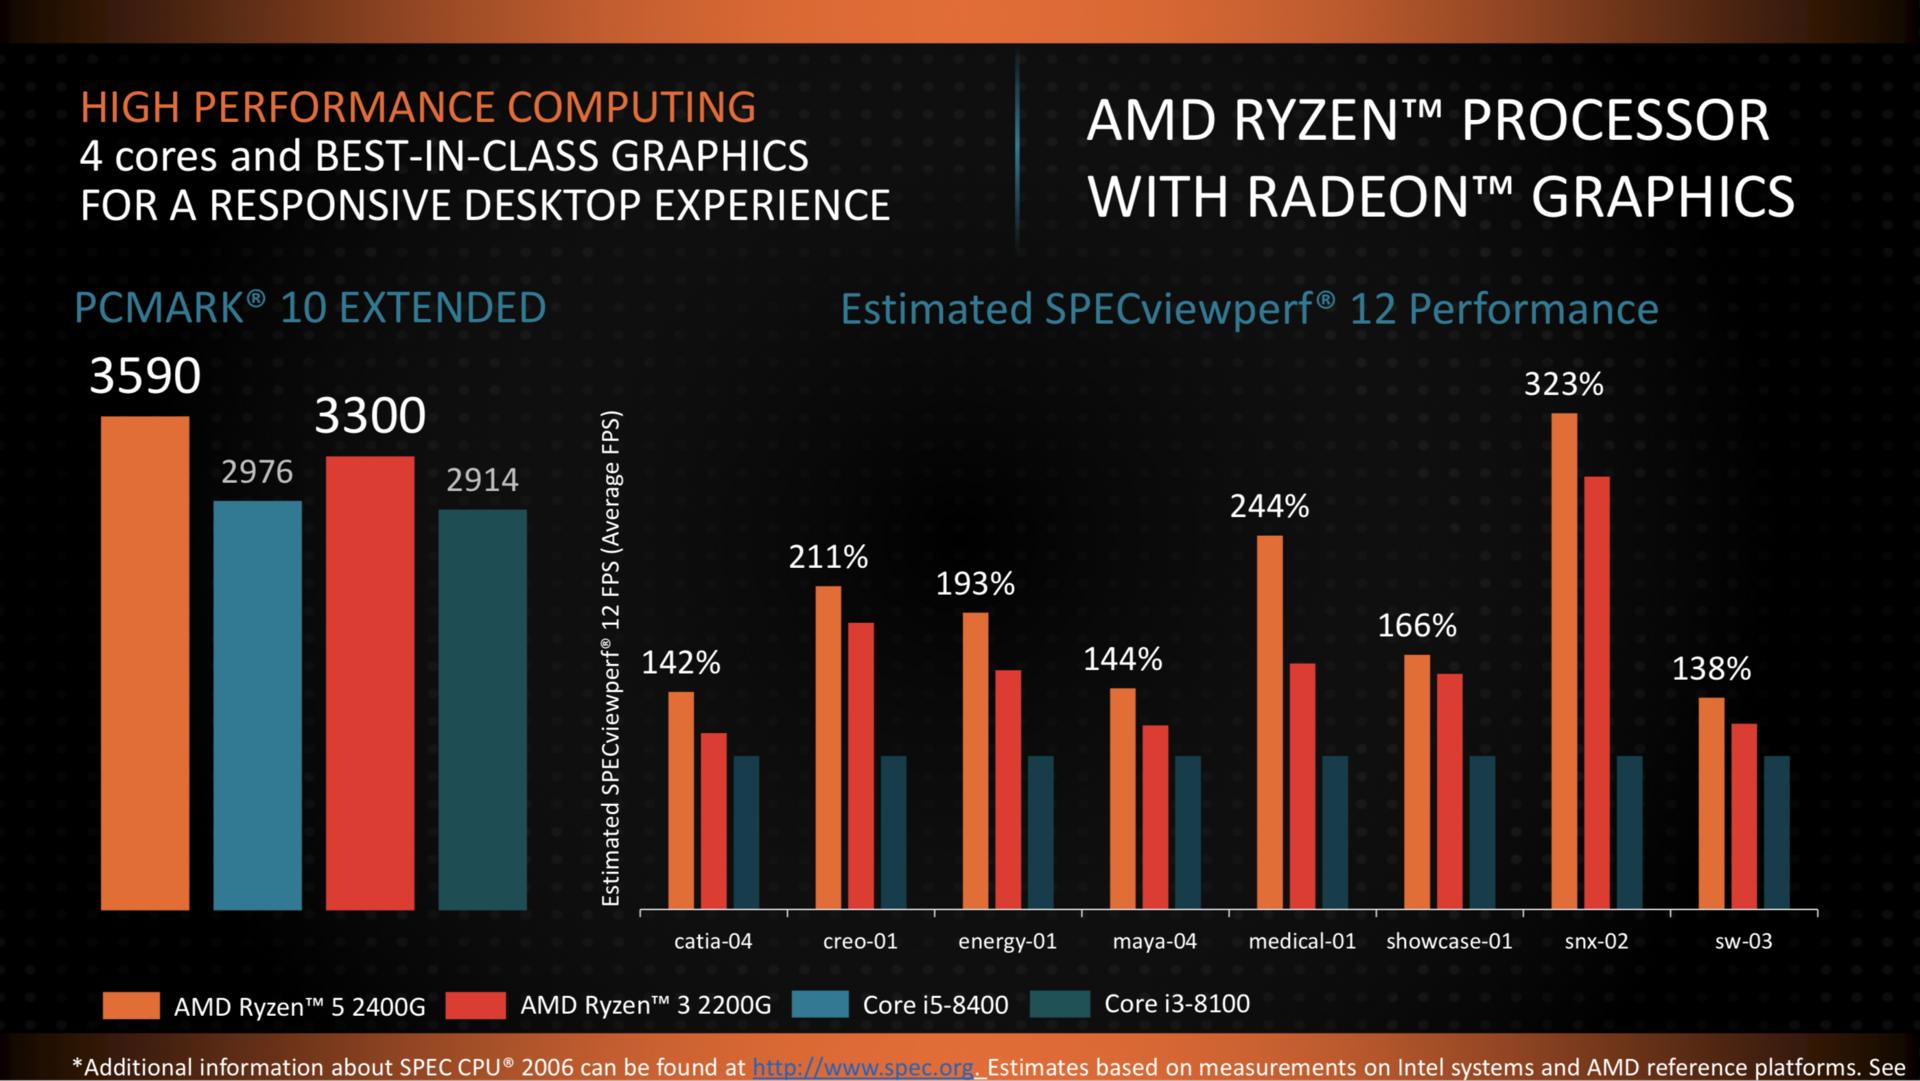 Ryzen Apus Announced For The Am4 Desktop Plattform